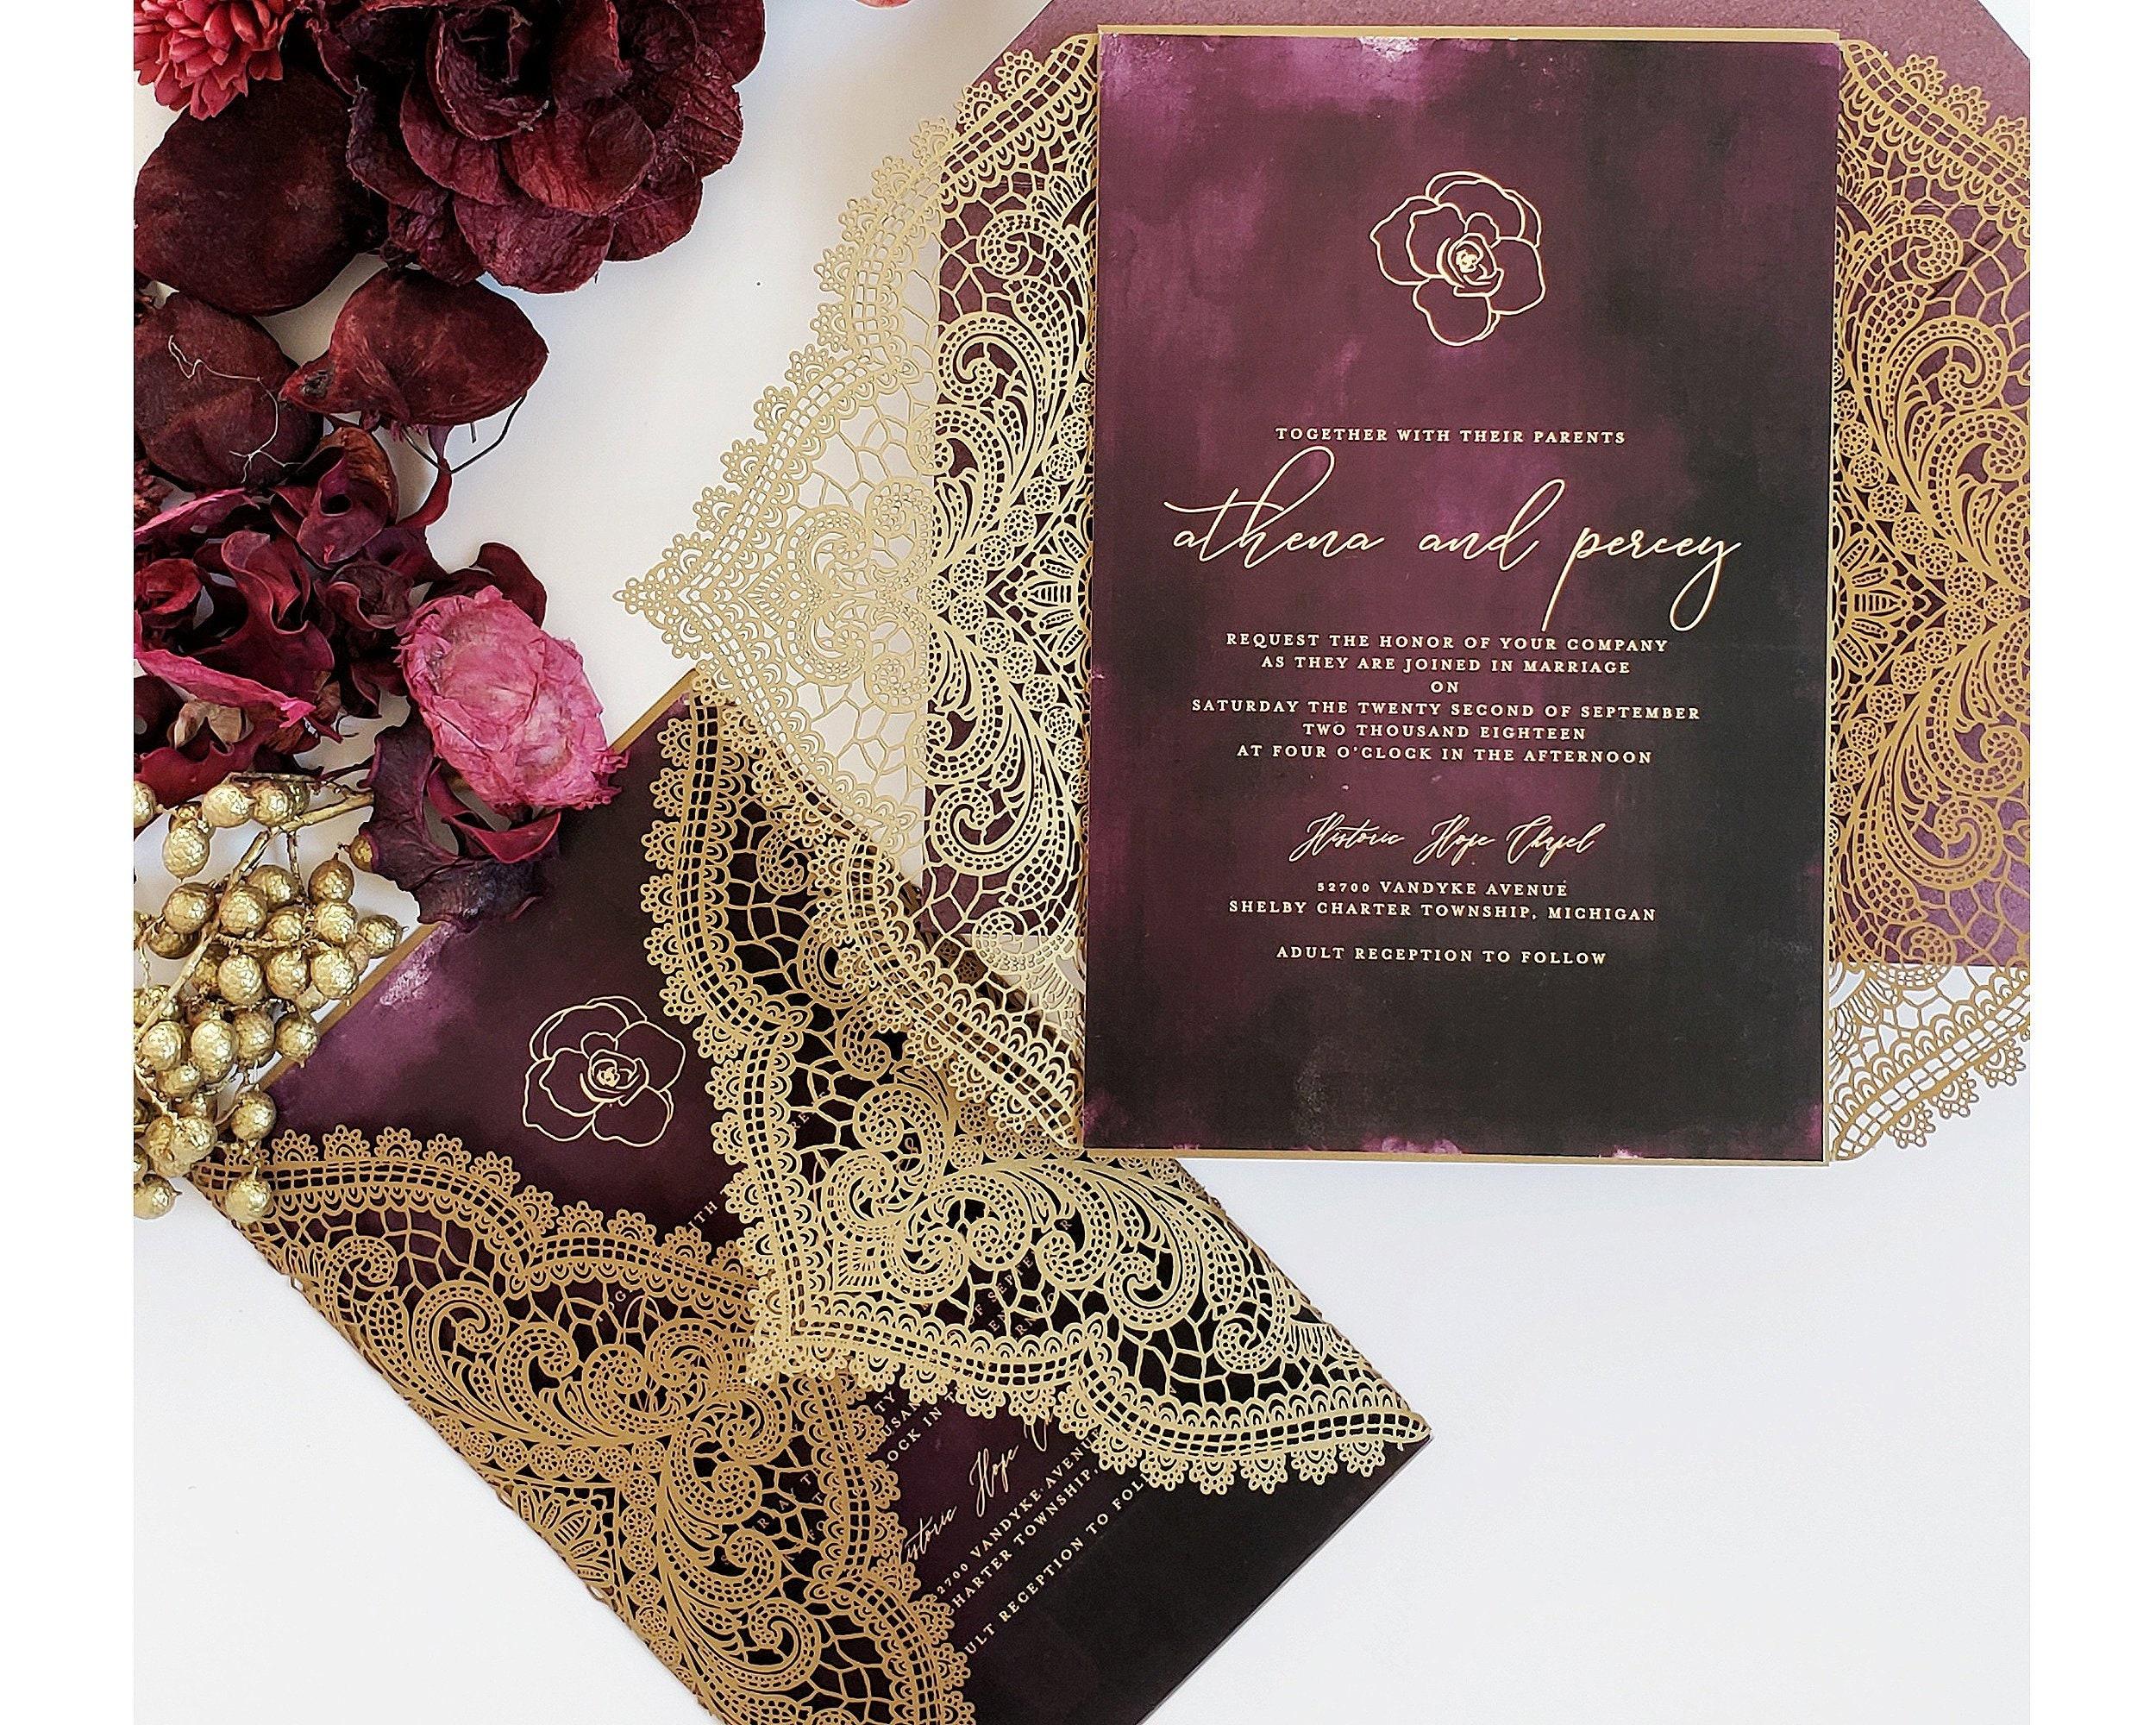 Purple And Gold Wedding Invitations: Moody Wedding Invitations Gold And Marsala, Purple And